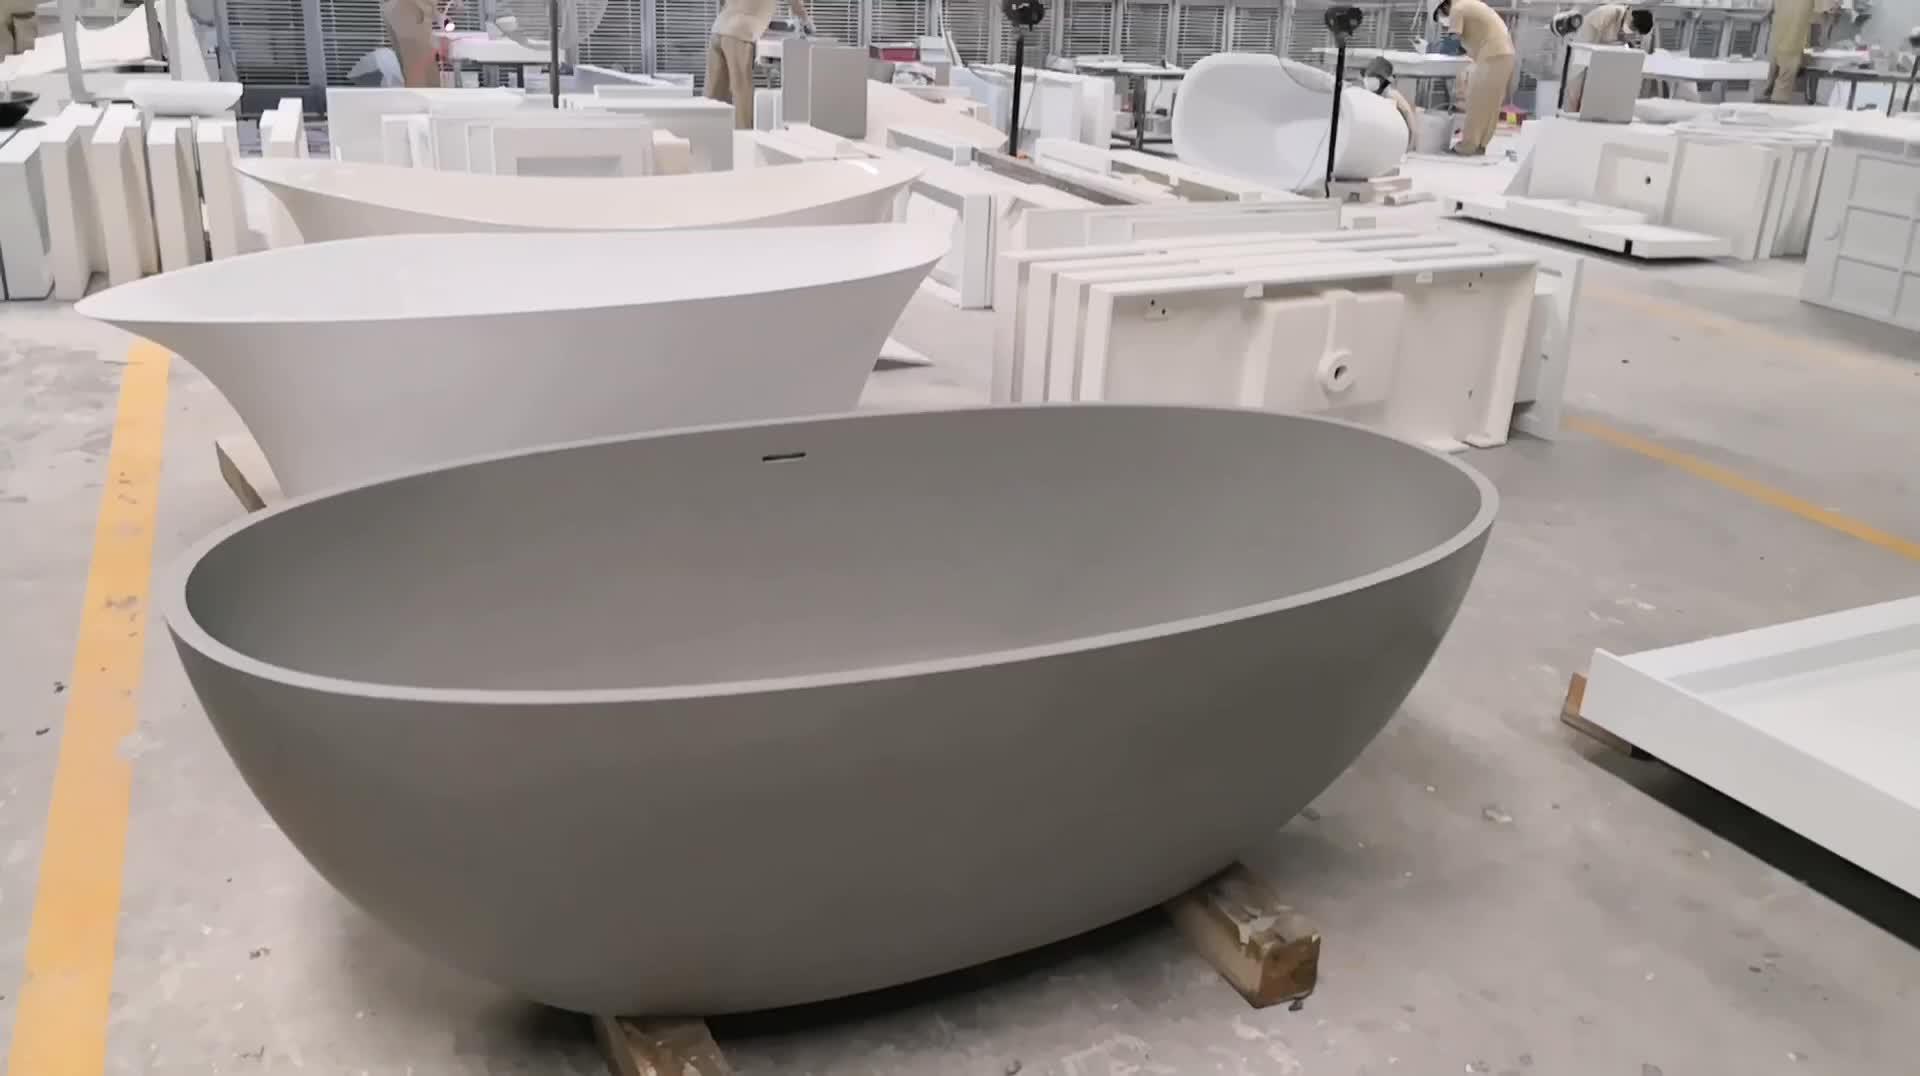 Brand New Black Bathtub Freestanding Oval Stand Alone Acrylic Bath ...